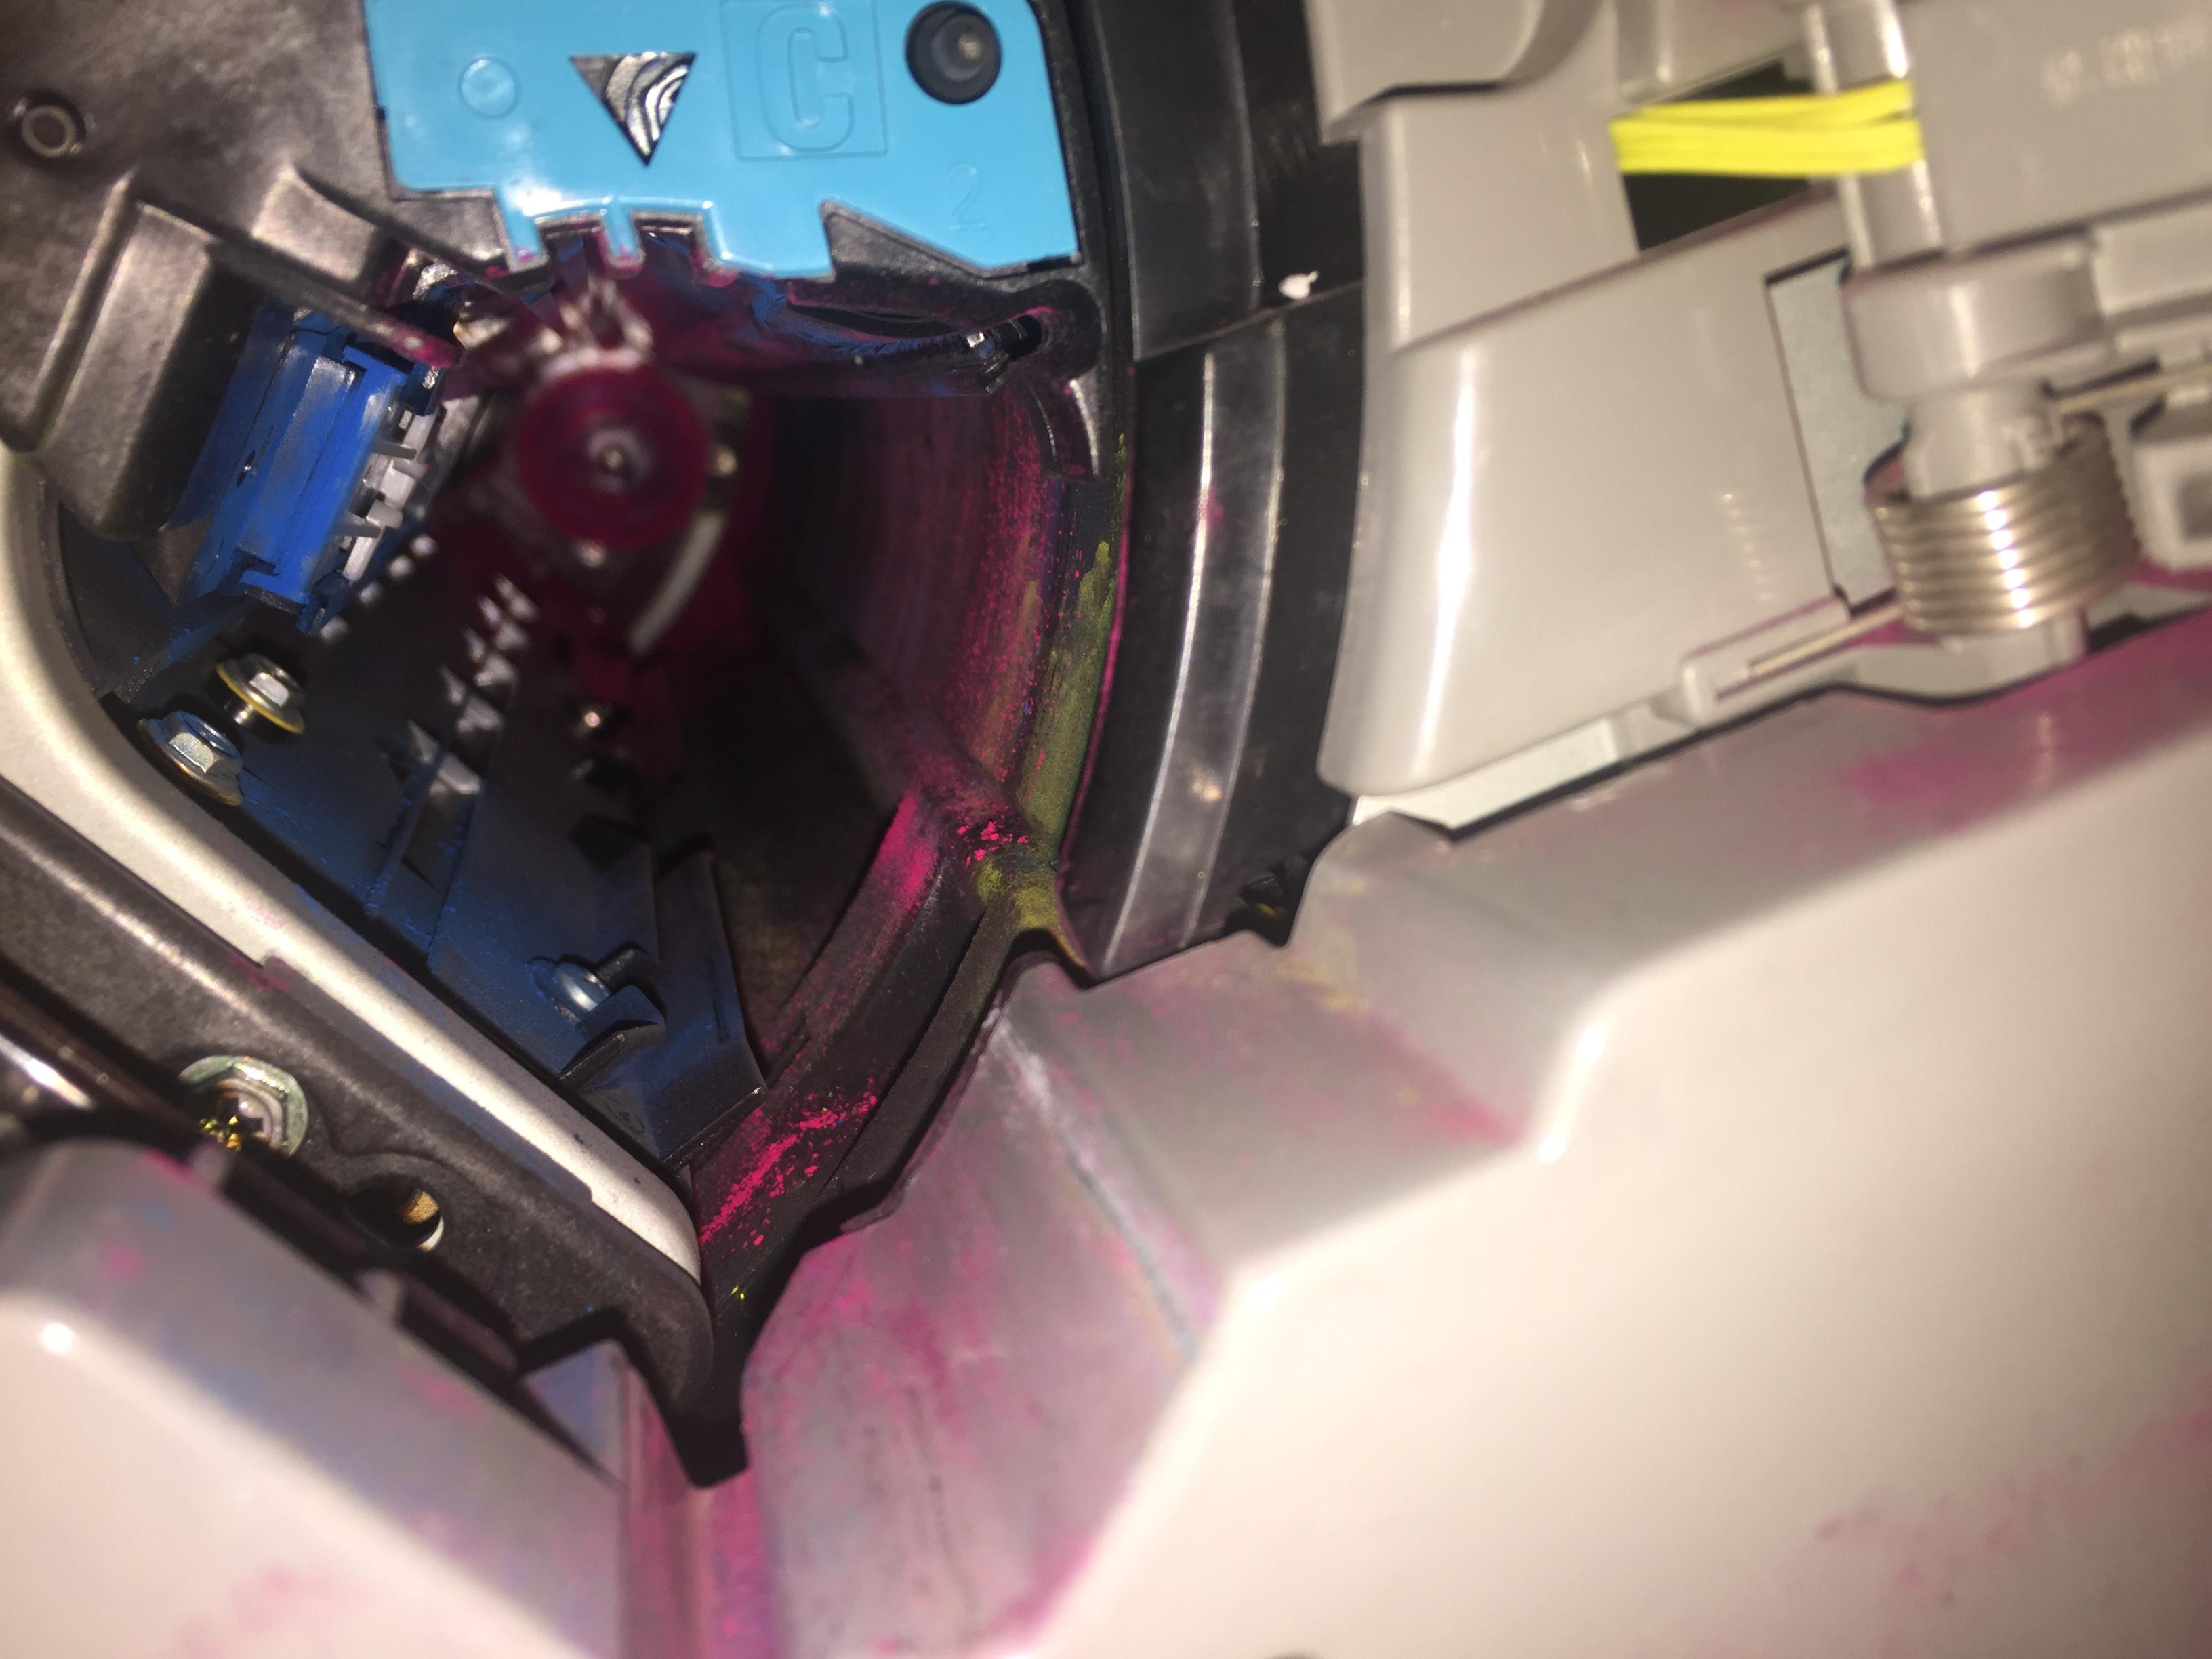 Xerox Workcenter 7232 - Streaking - Toner leakage ... - Customer Support  Forum